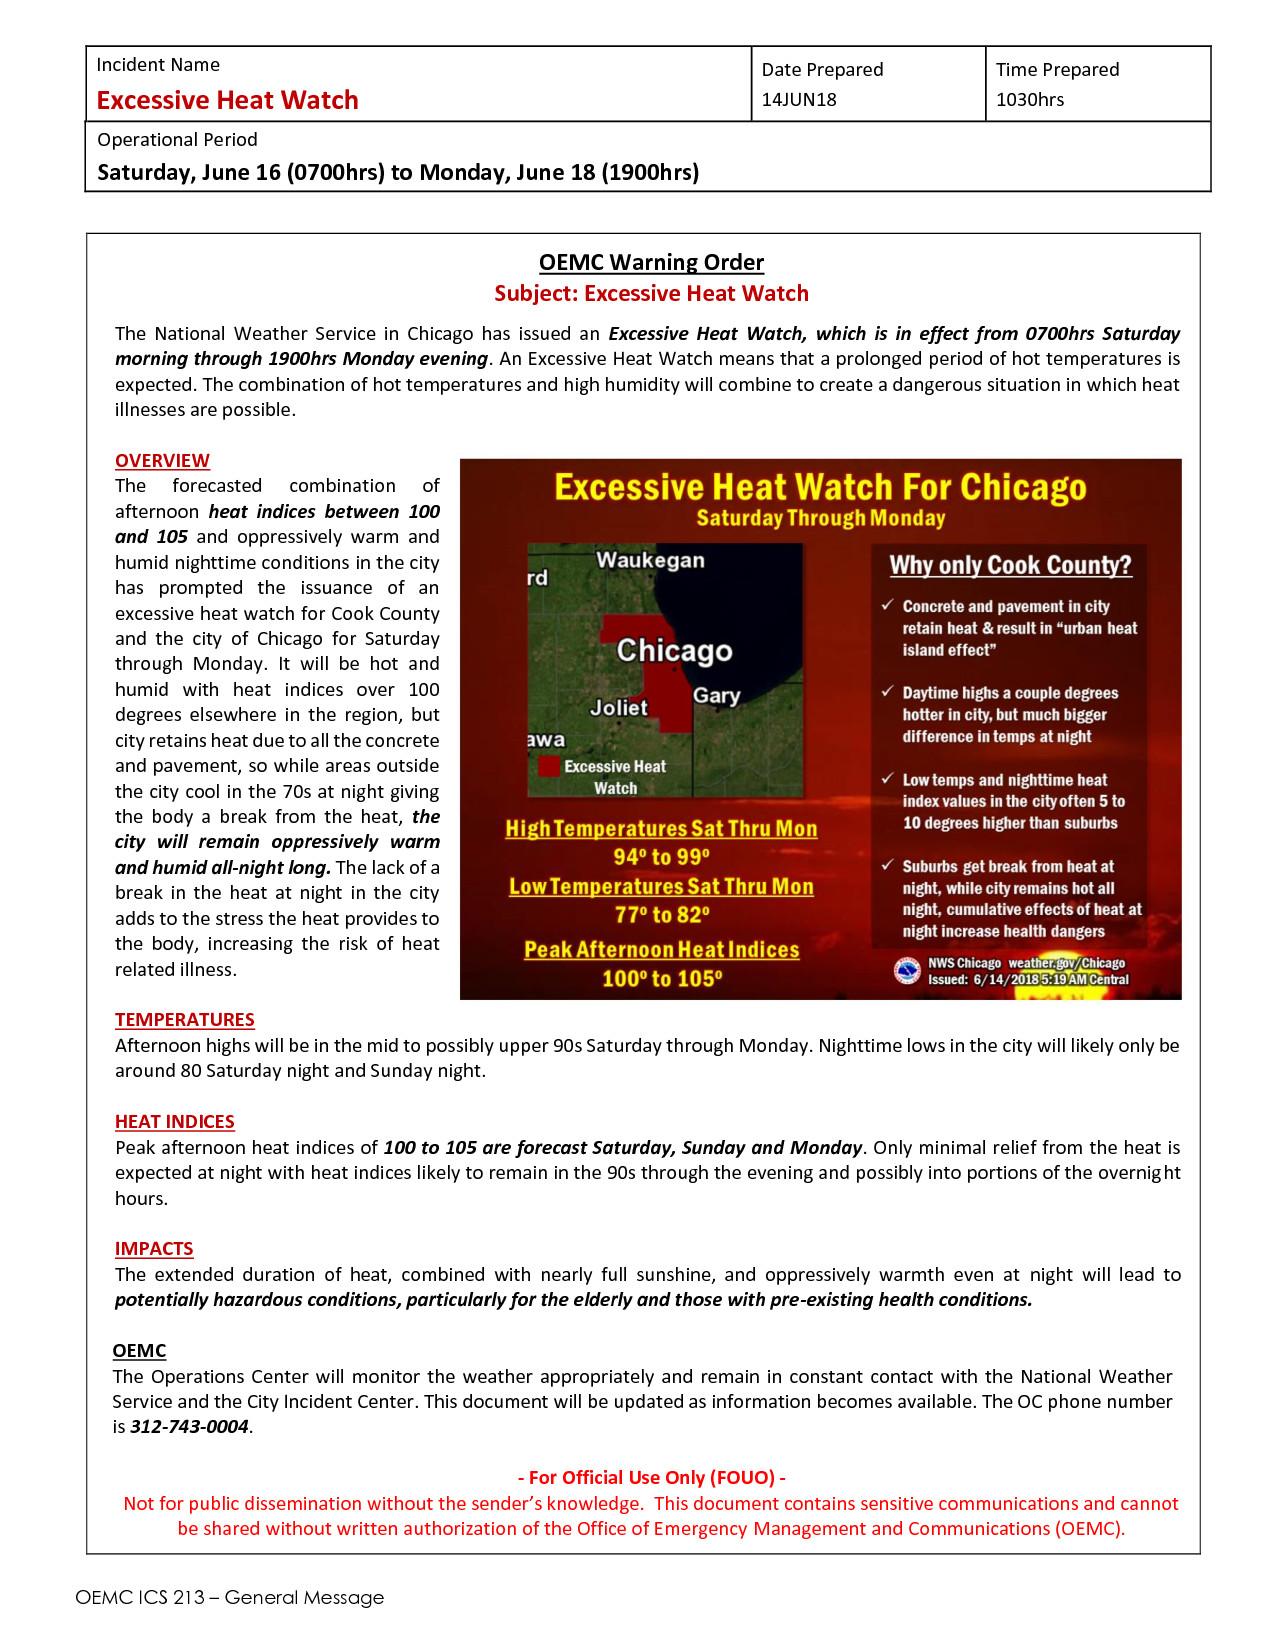 OEMC Warning Order Excessive Heat Watch June 16-18_14JUN18 1030hrs.jpg